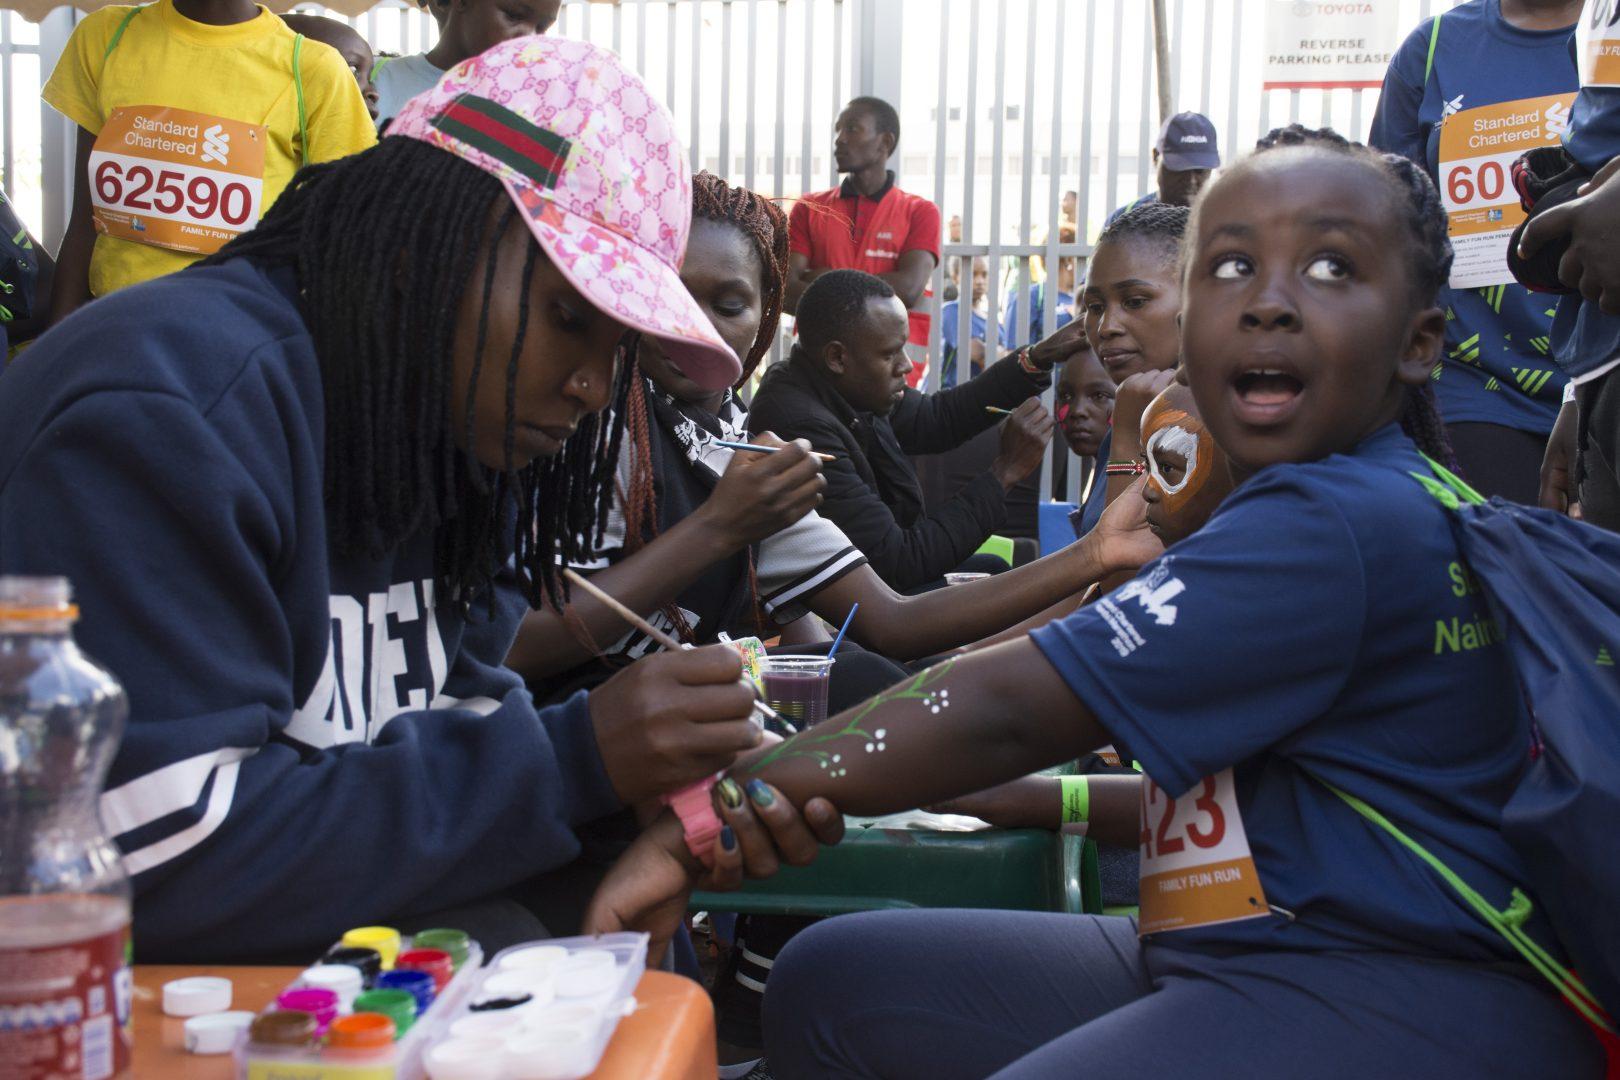 https://www.nairobimarathon.com/wp-content/uploads/2021/07/DSC_3068.jpg